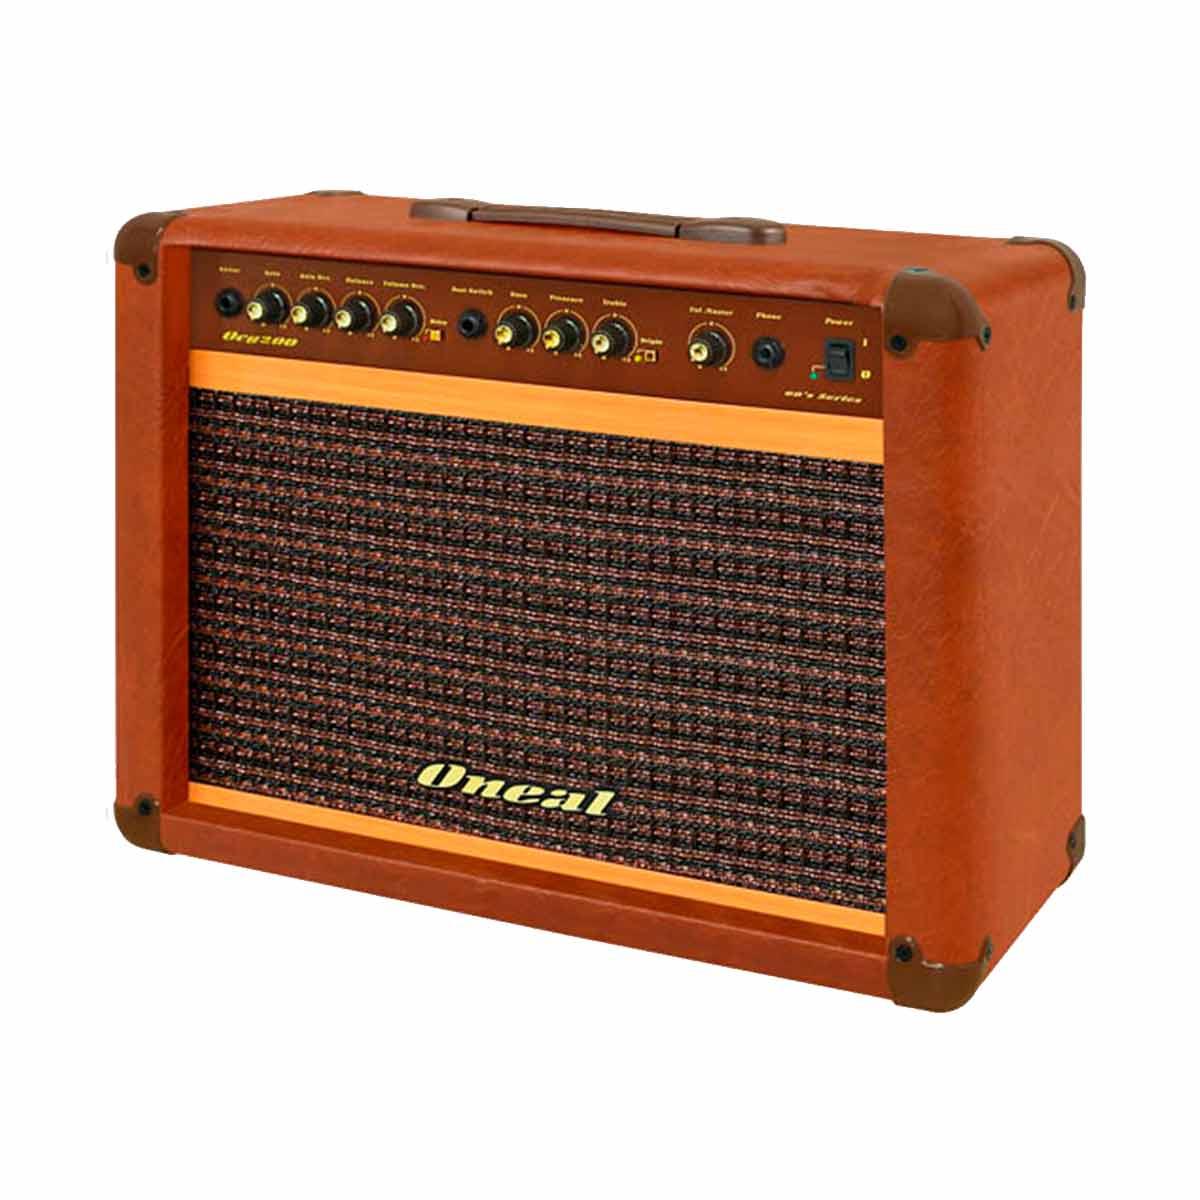 Amplificador Combo p/ Guitarra 60W OCG 200 Marrom - Oneal